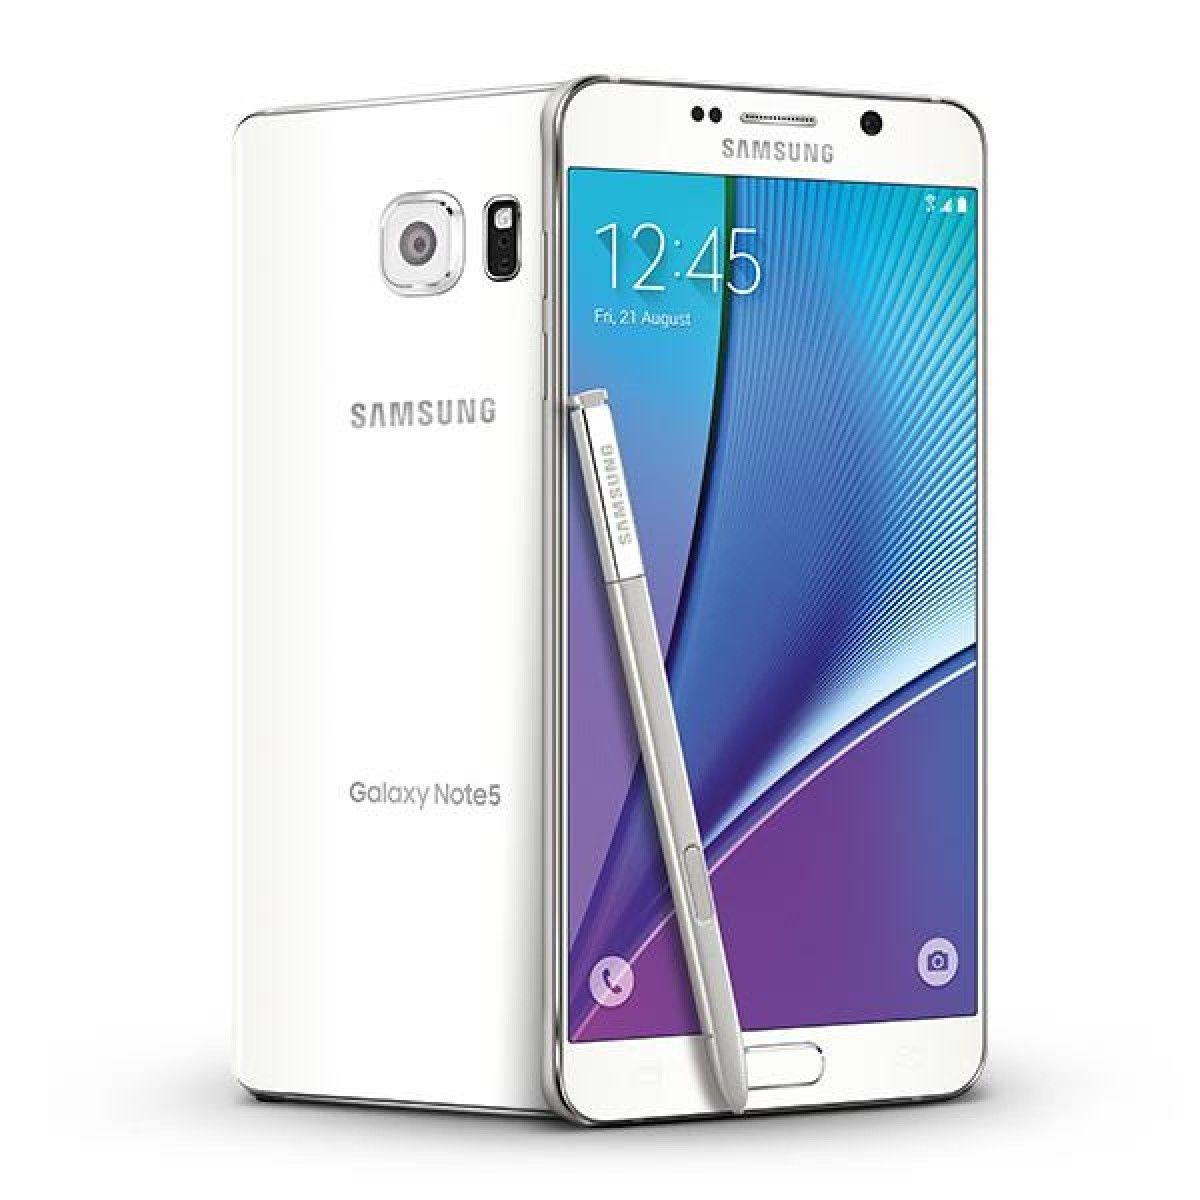 Samsung Galaxy Note 5 White Price In Nigeria Samsung Galaxy New Samsung Galaxy Galaxy Note 5